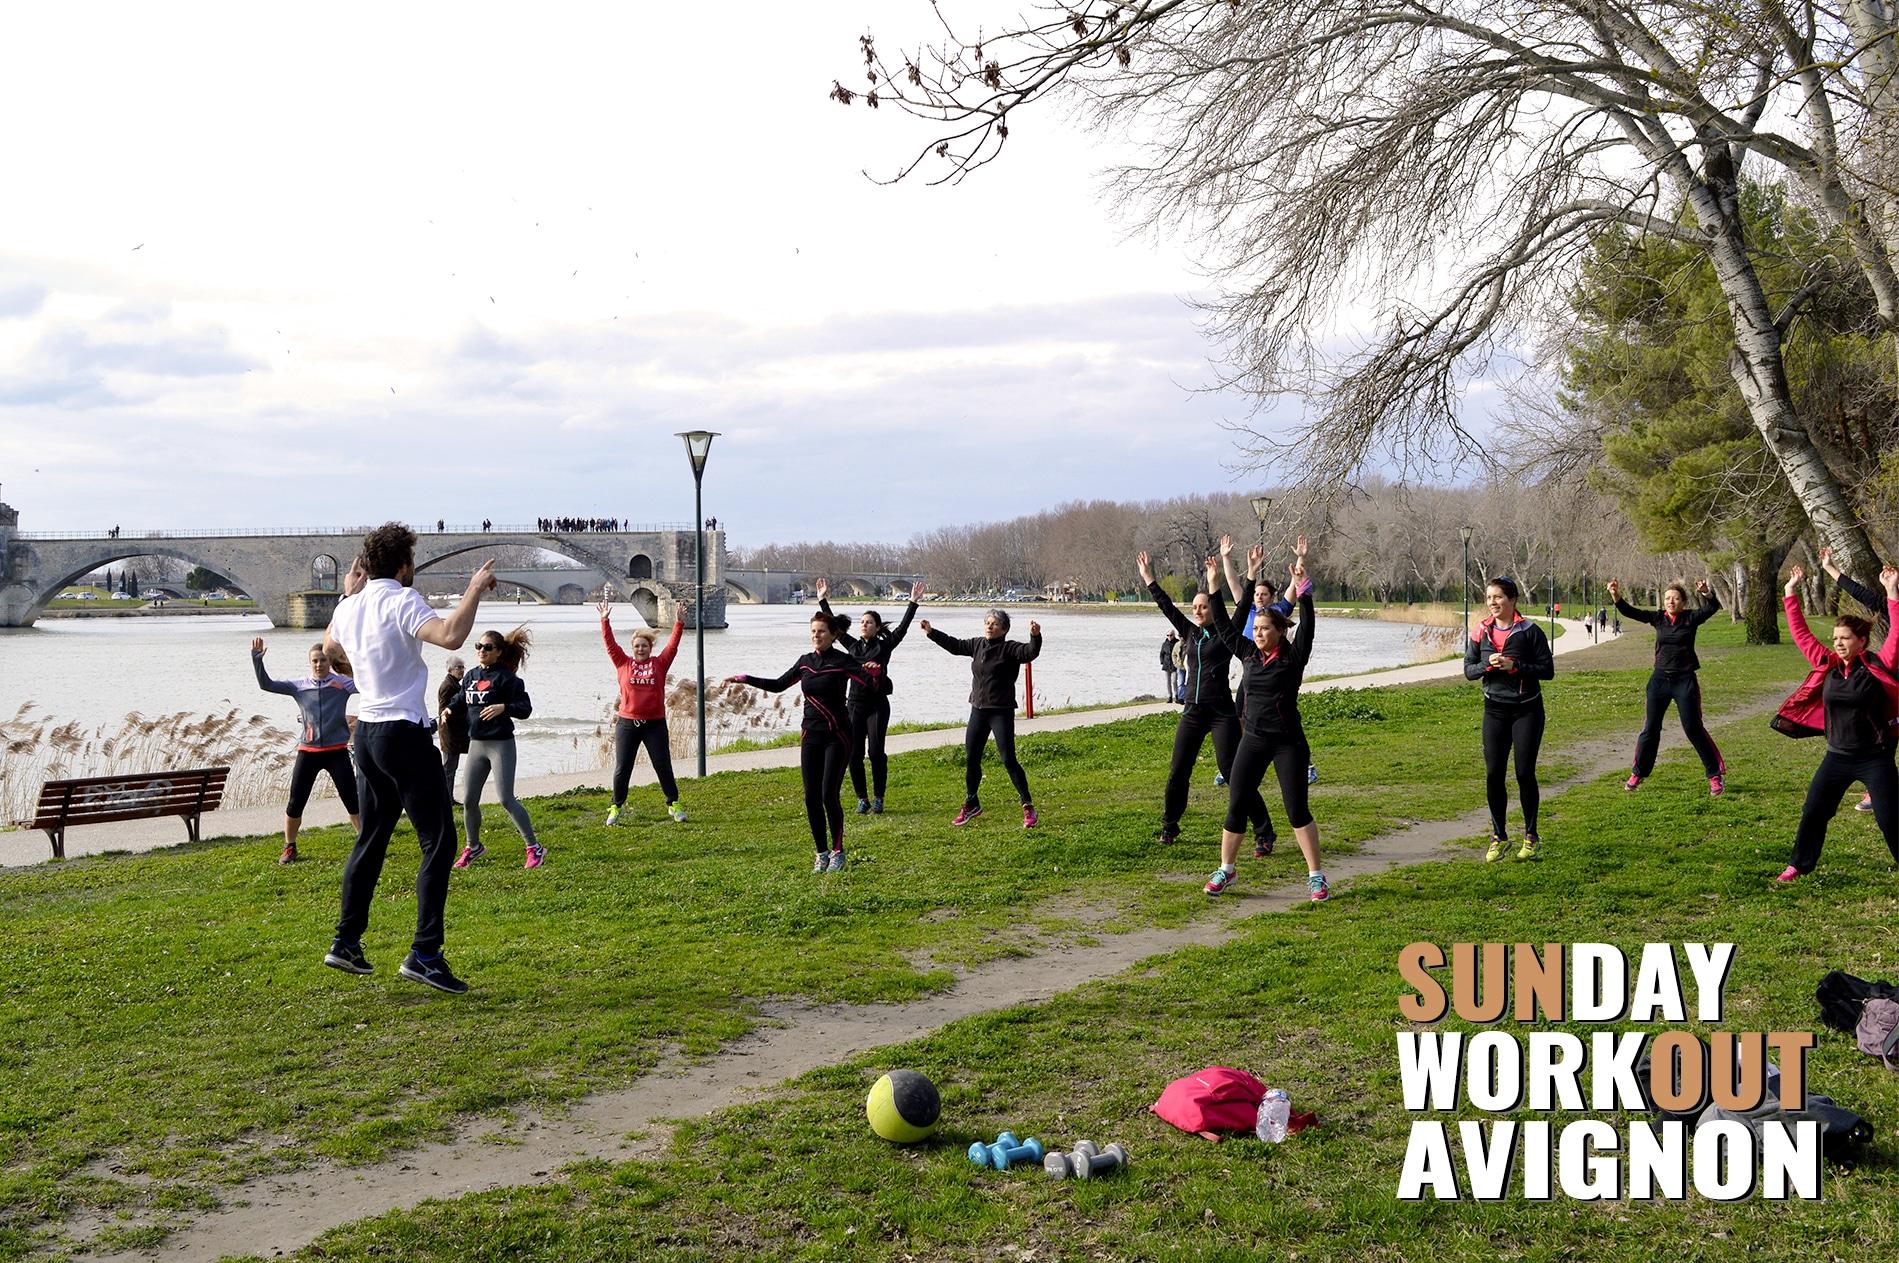 Sunday Workout Avignon 9 Coach circuit training fitness yoga pilates sport plein air evenement